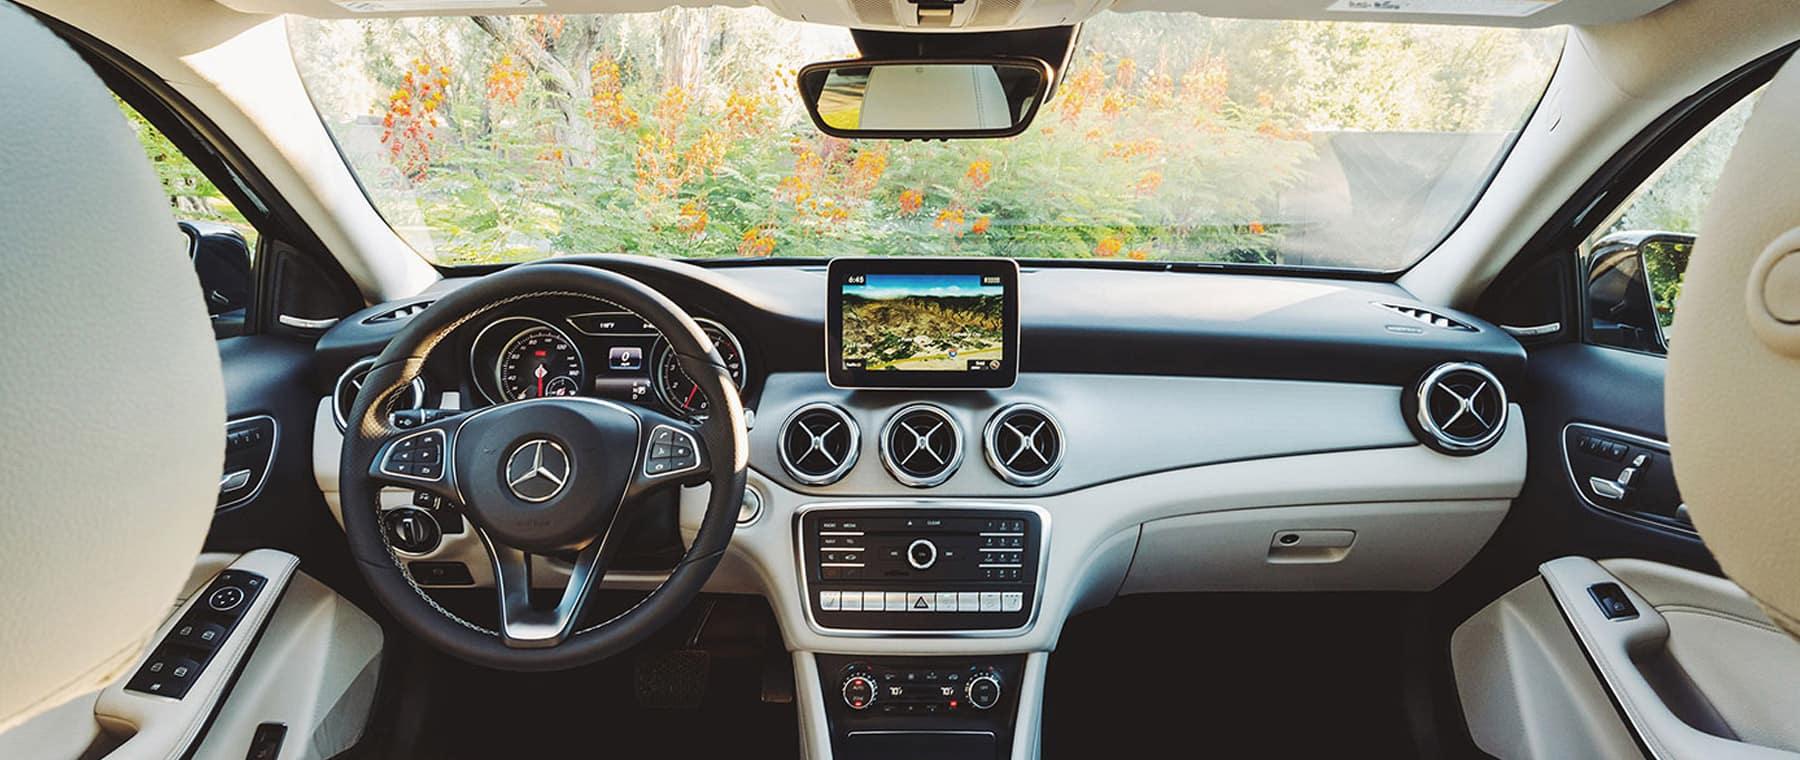 2019 Mercedes-Benz GLA SUV_3